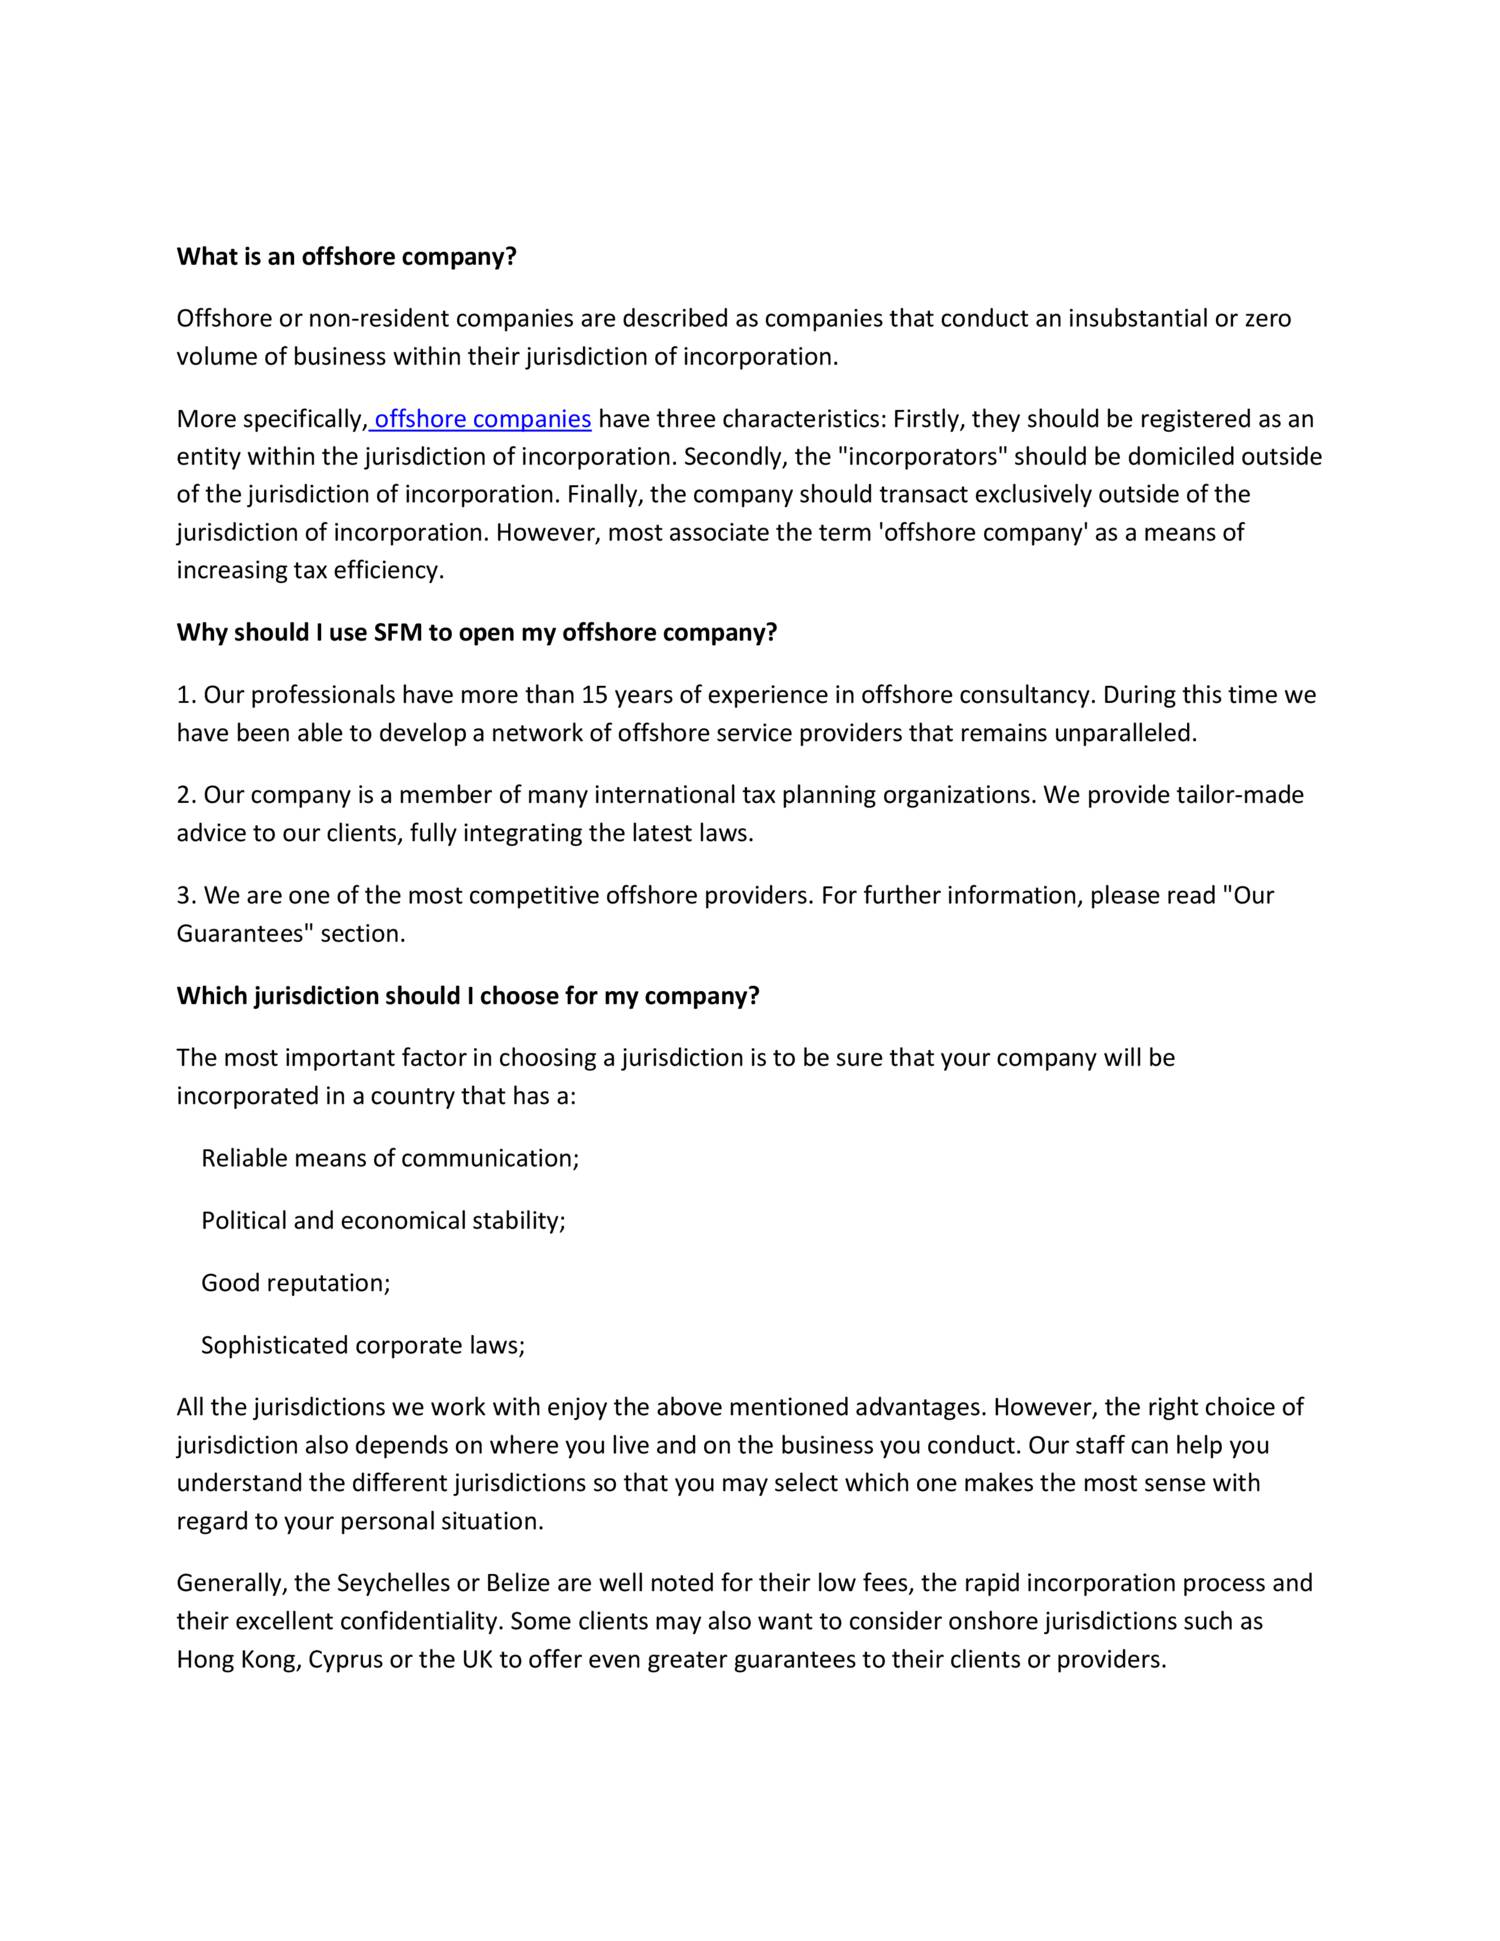 faqs regarding SFM offshore company formation.pdf | DocDroid